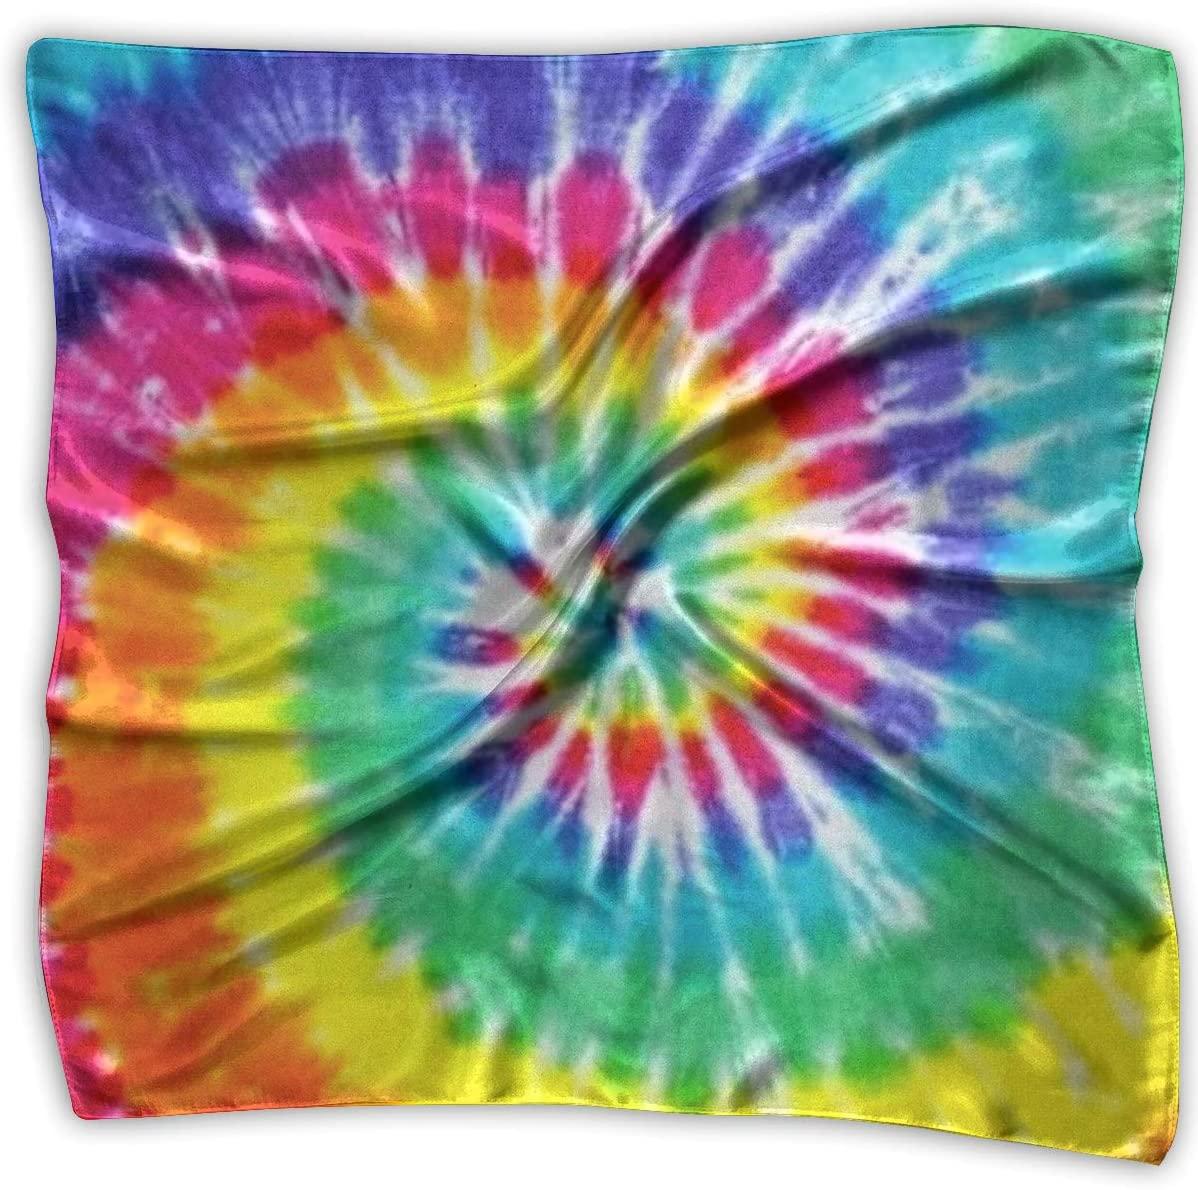 WFIRE Tye Dye Square Handkerchiefs Scarf Shawl Bandanas Headscarf Neckerchief Tie Hair Scarf